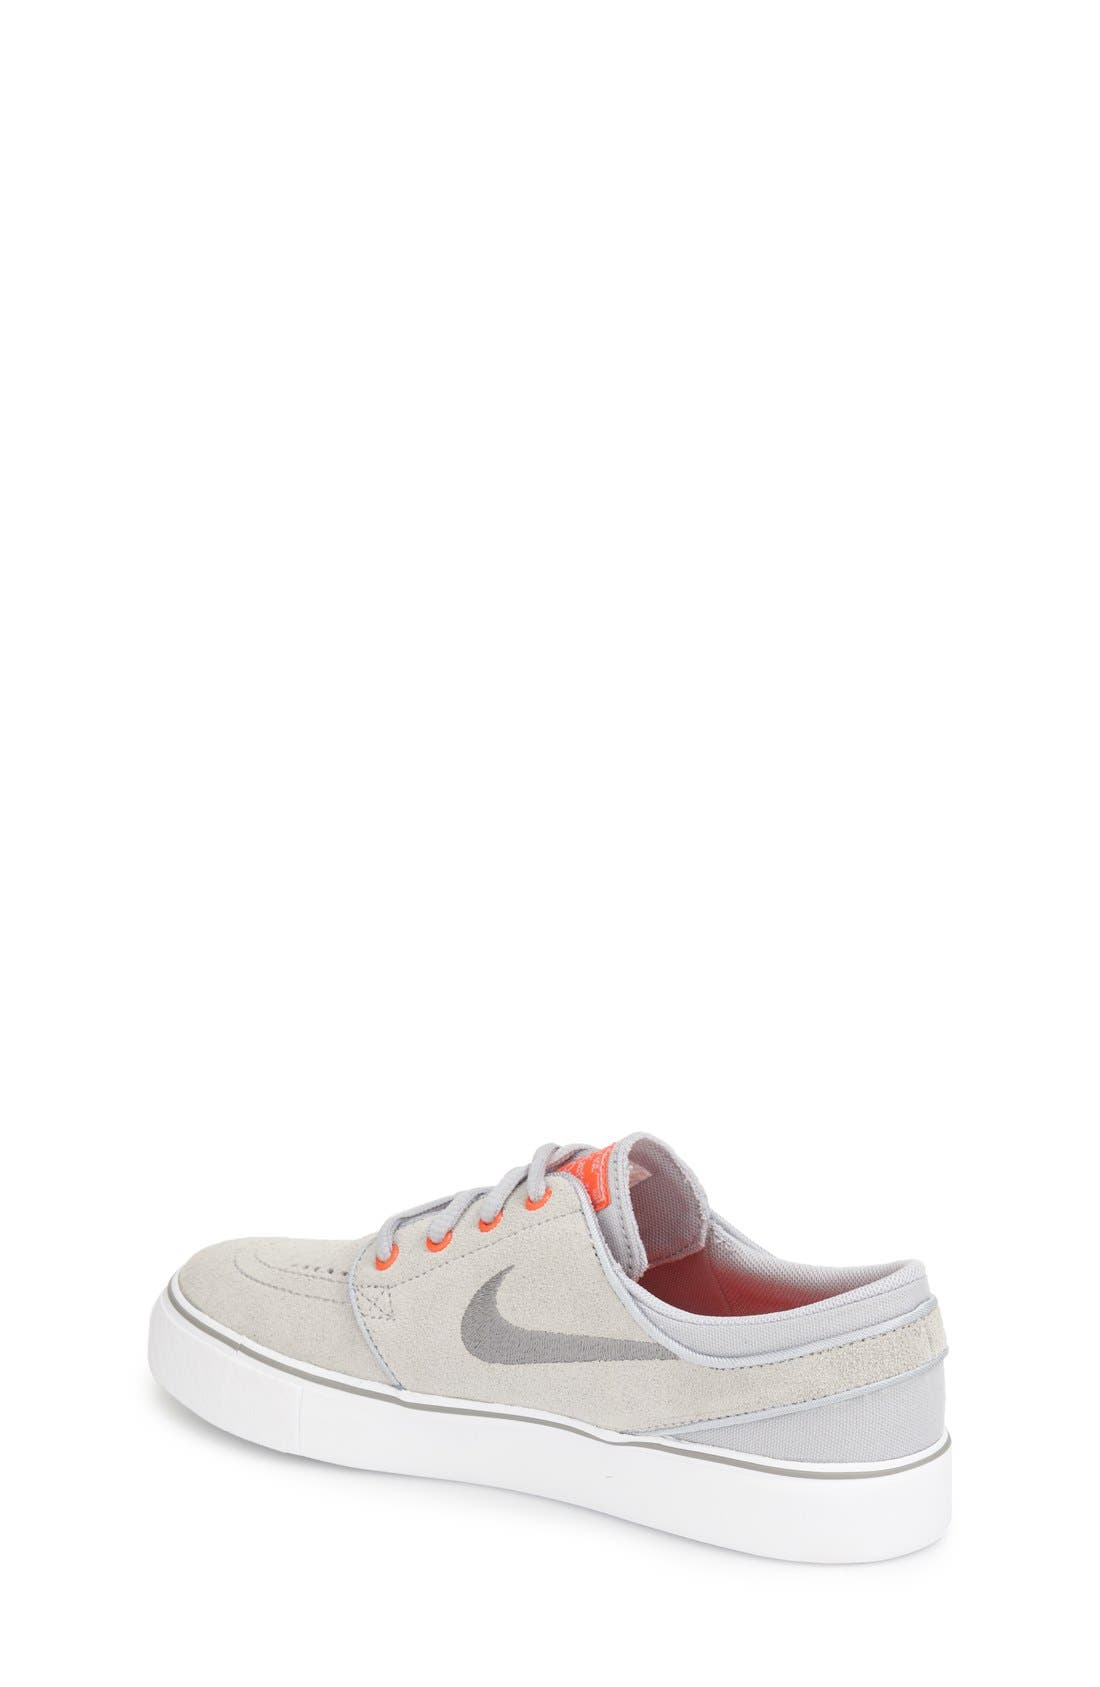 'Stefan Janoski' Sneaker,                             Alternate thumbnail 24, color,